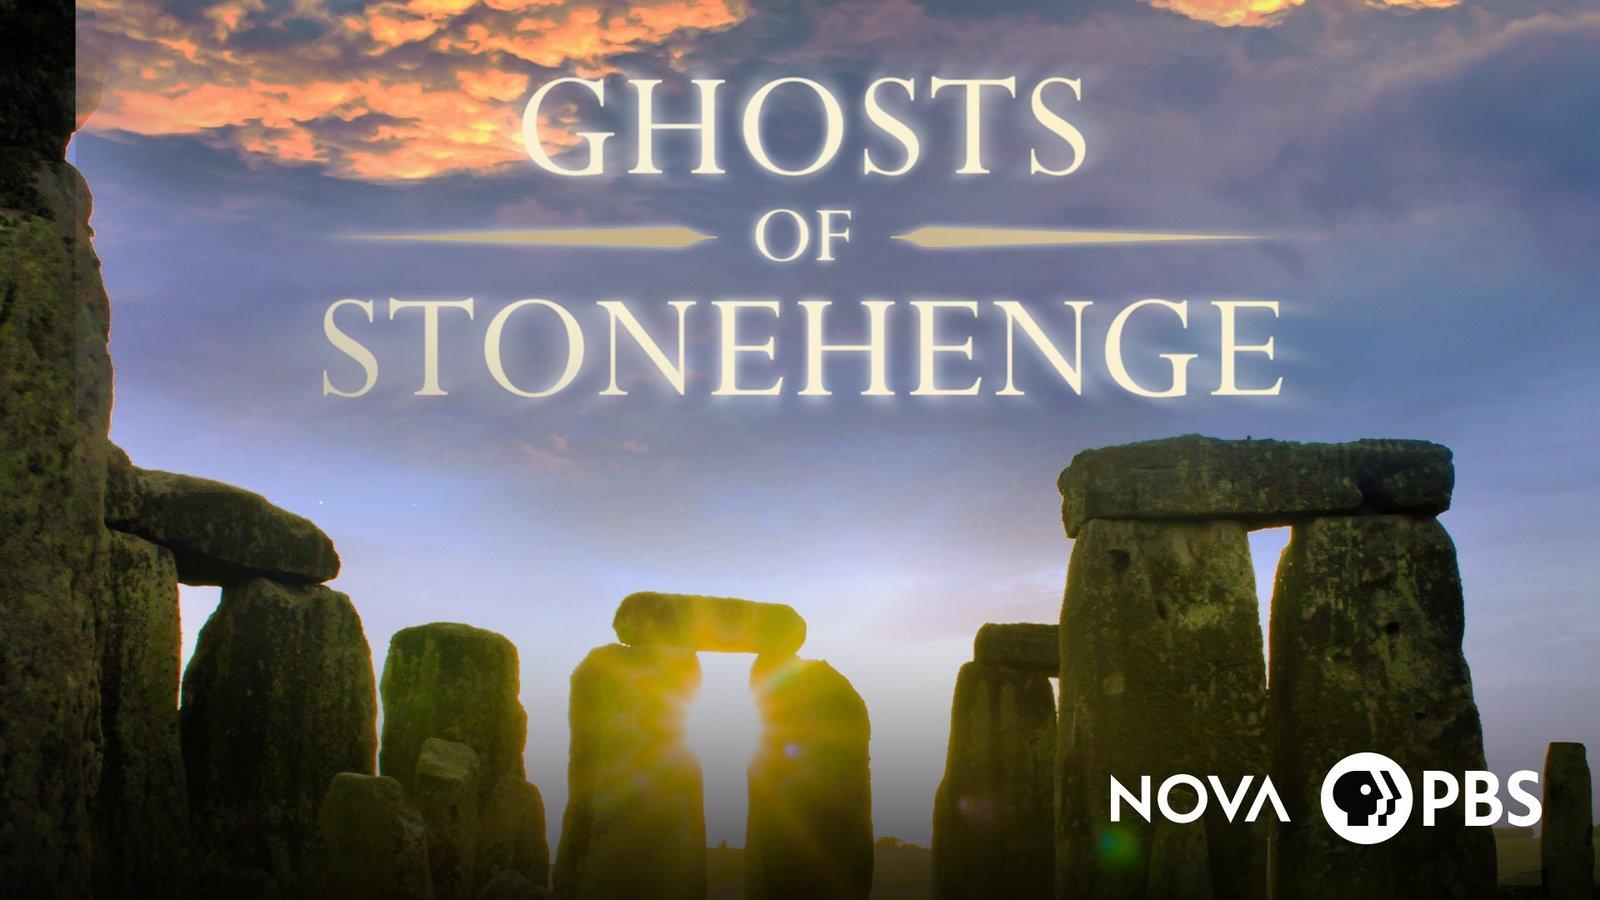 Ghosts of Stonehenge